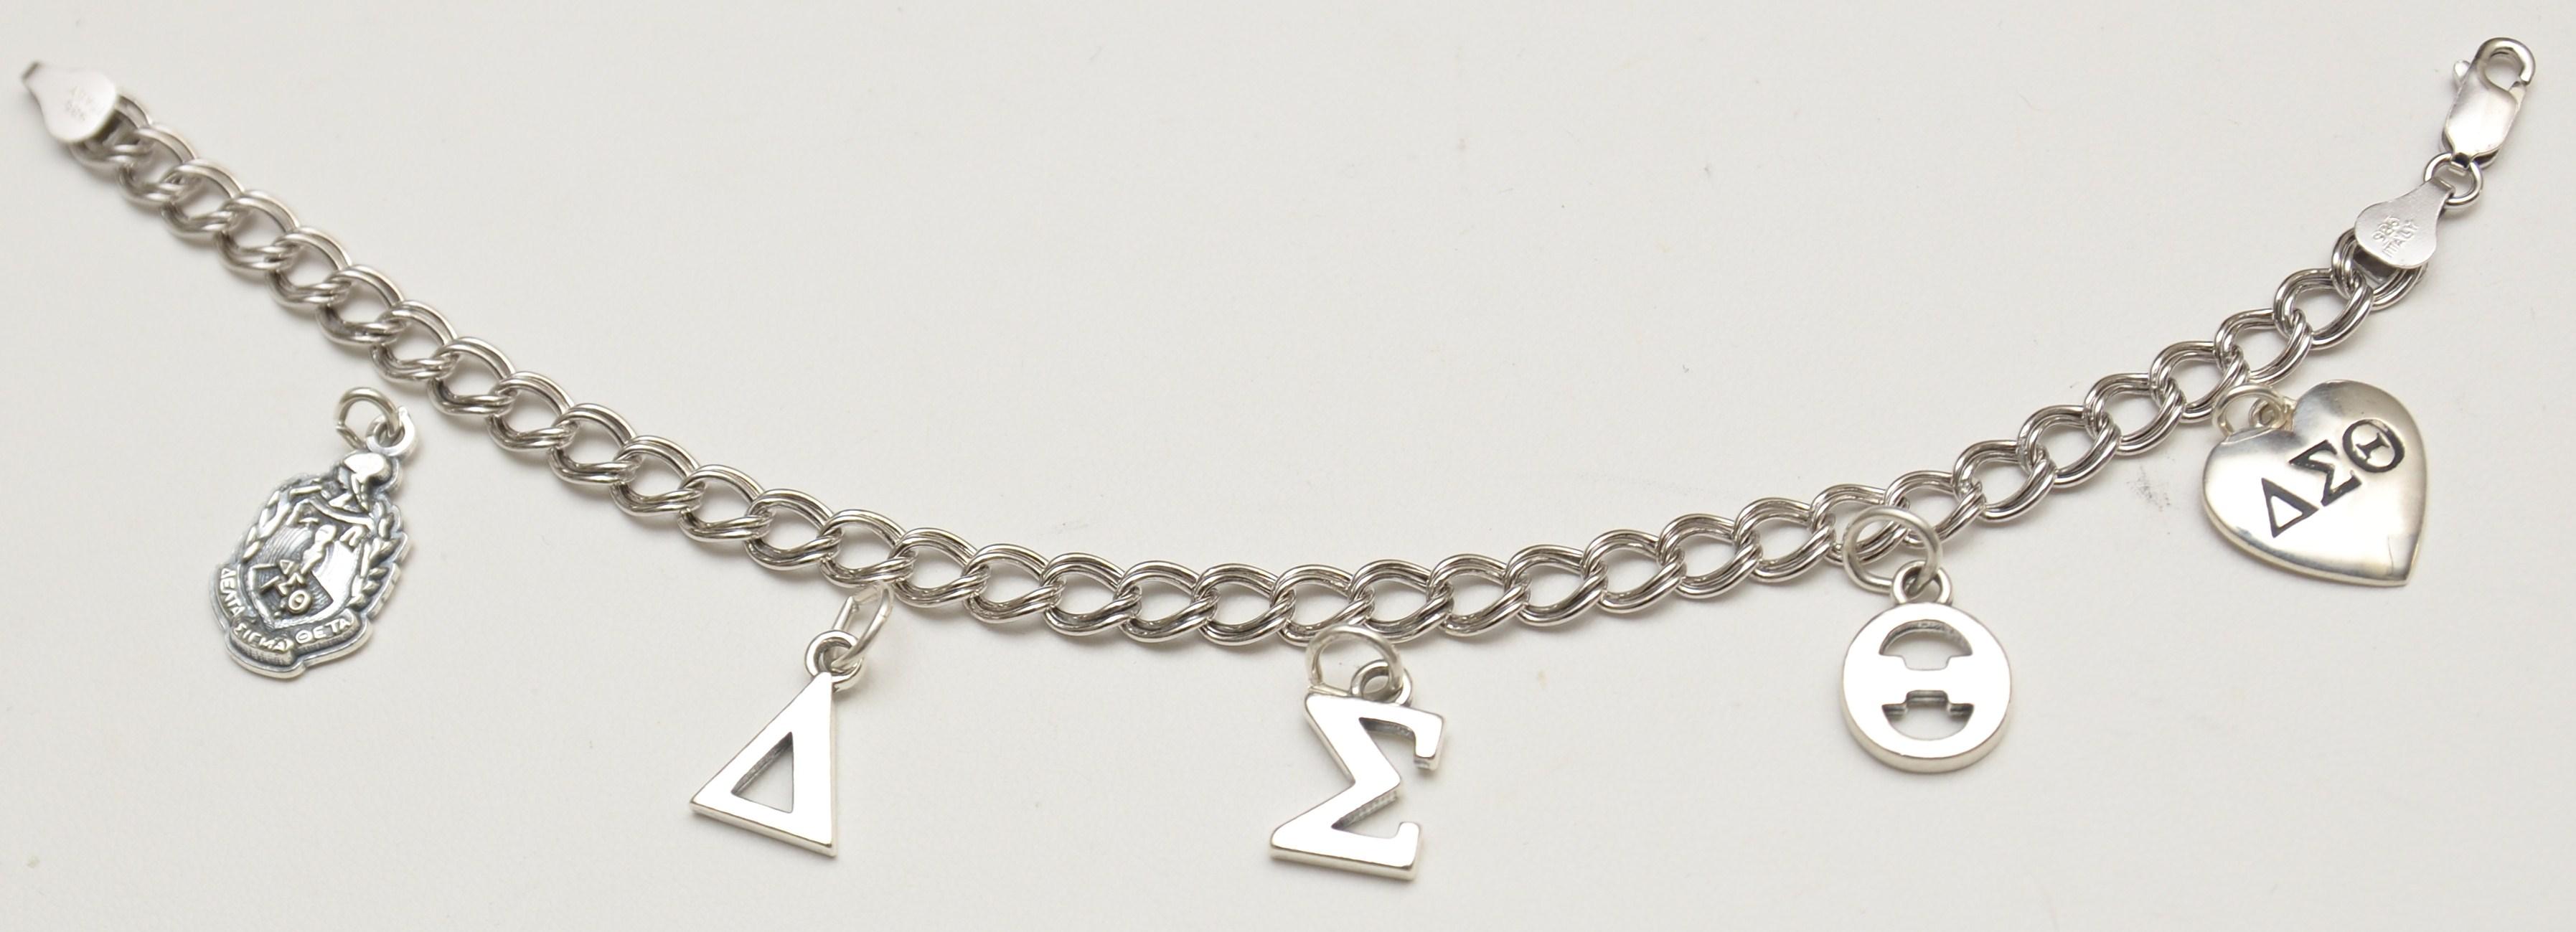 Delta Sigma Theta Sterling Silver Charm Bracelet 5 Charms JLM